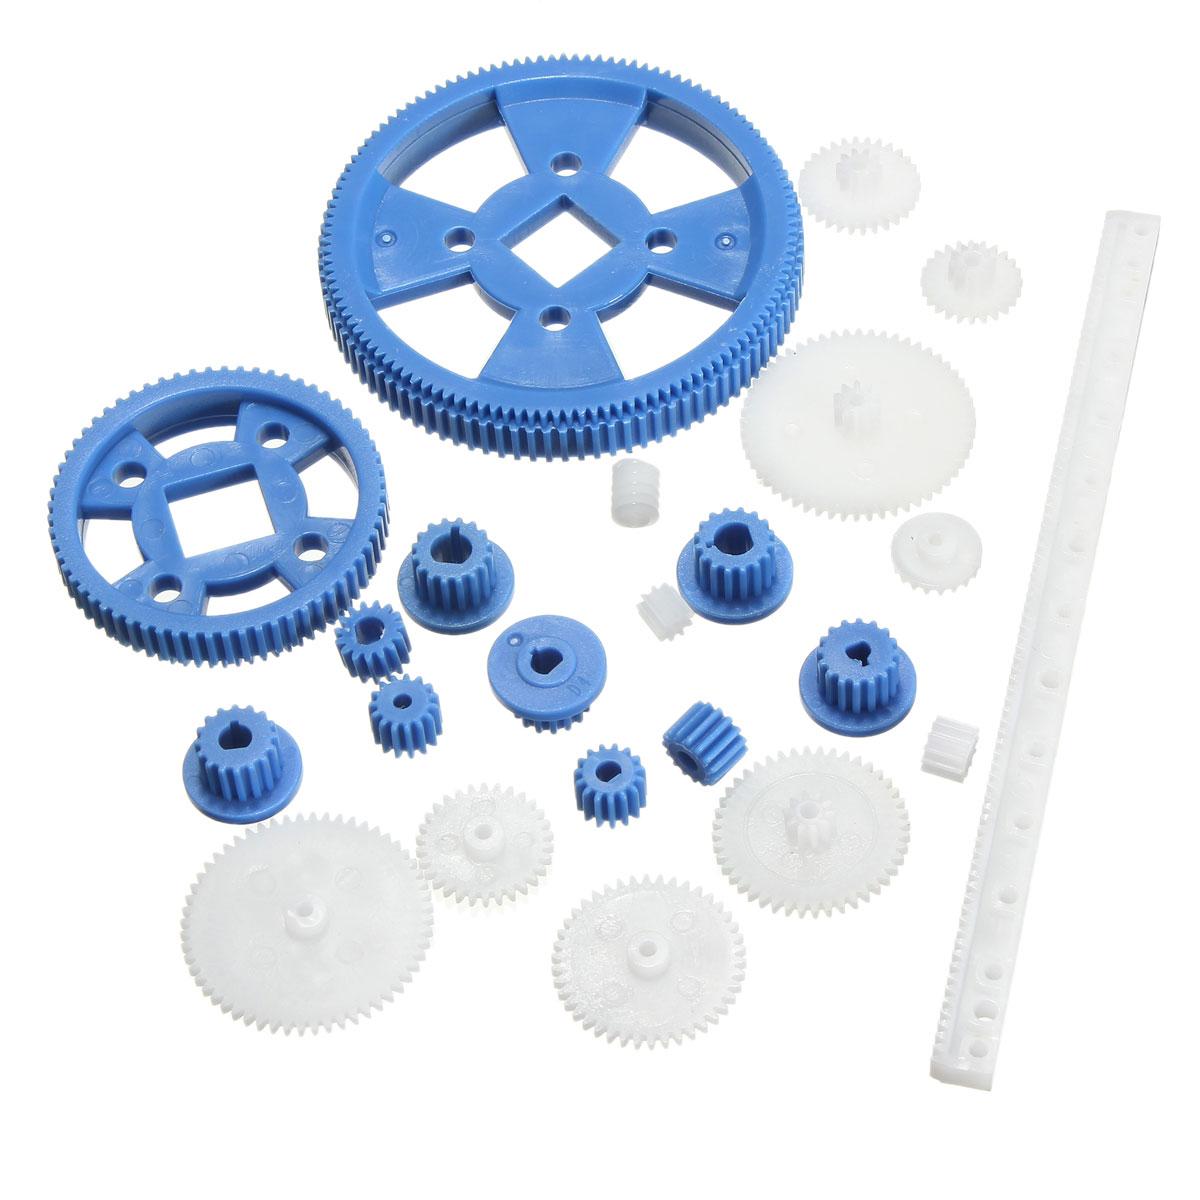 MEGA Plastic Gear Gearbox Motor Gear Remote Control Car